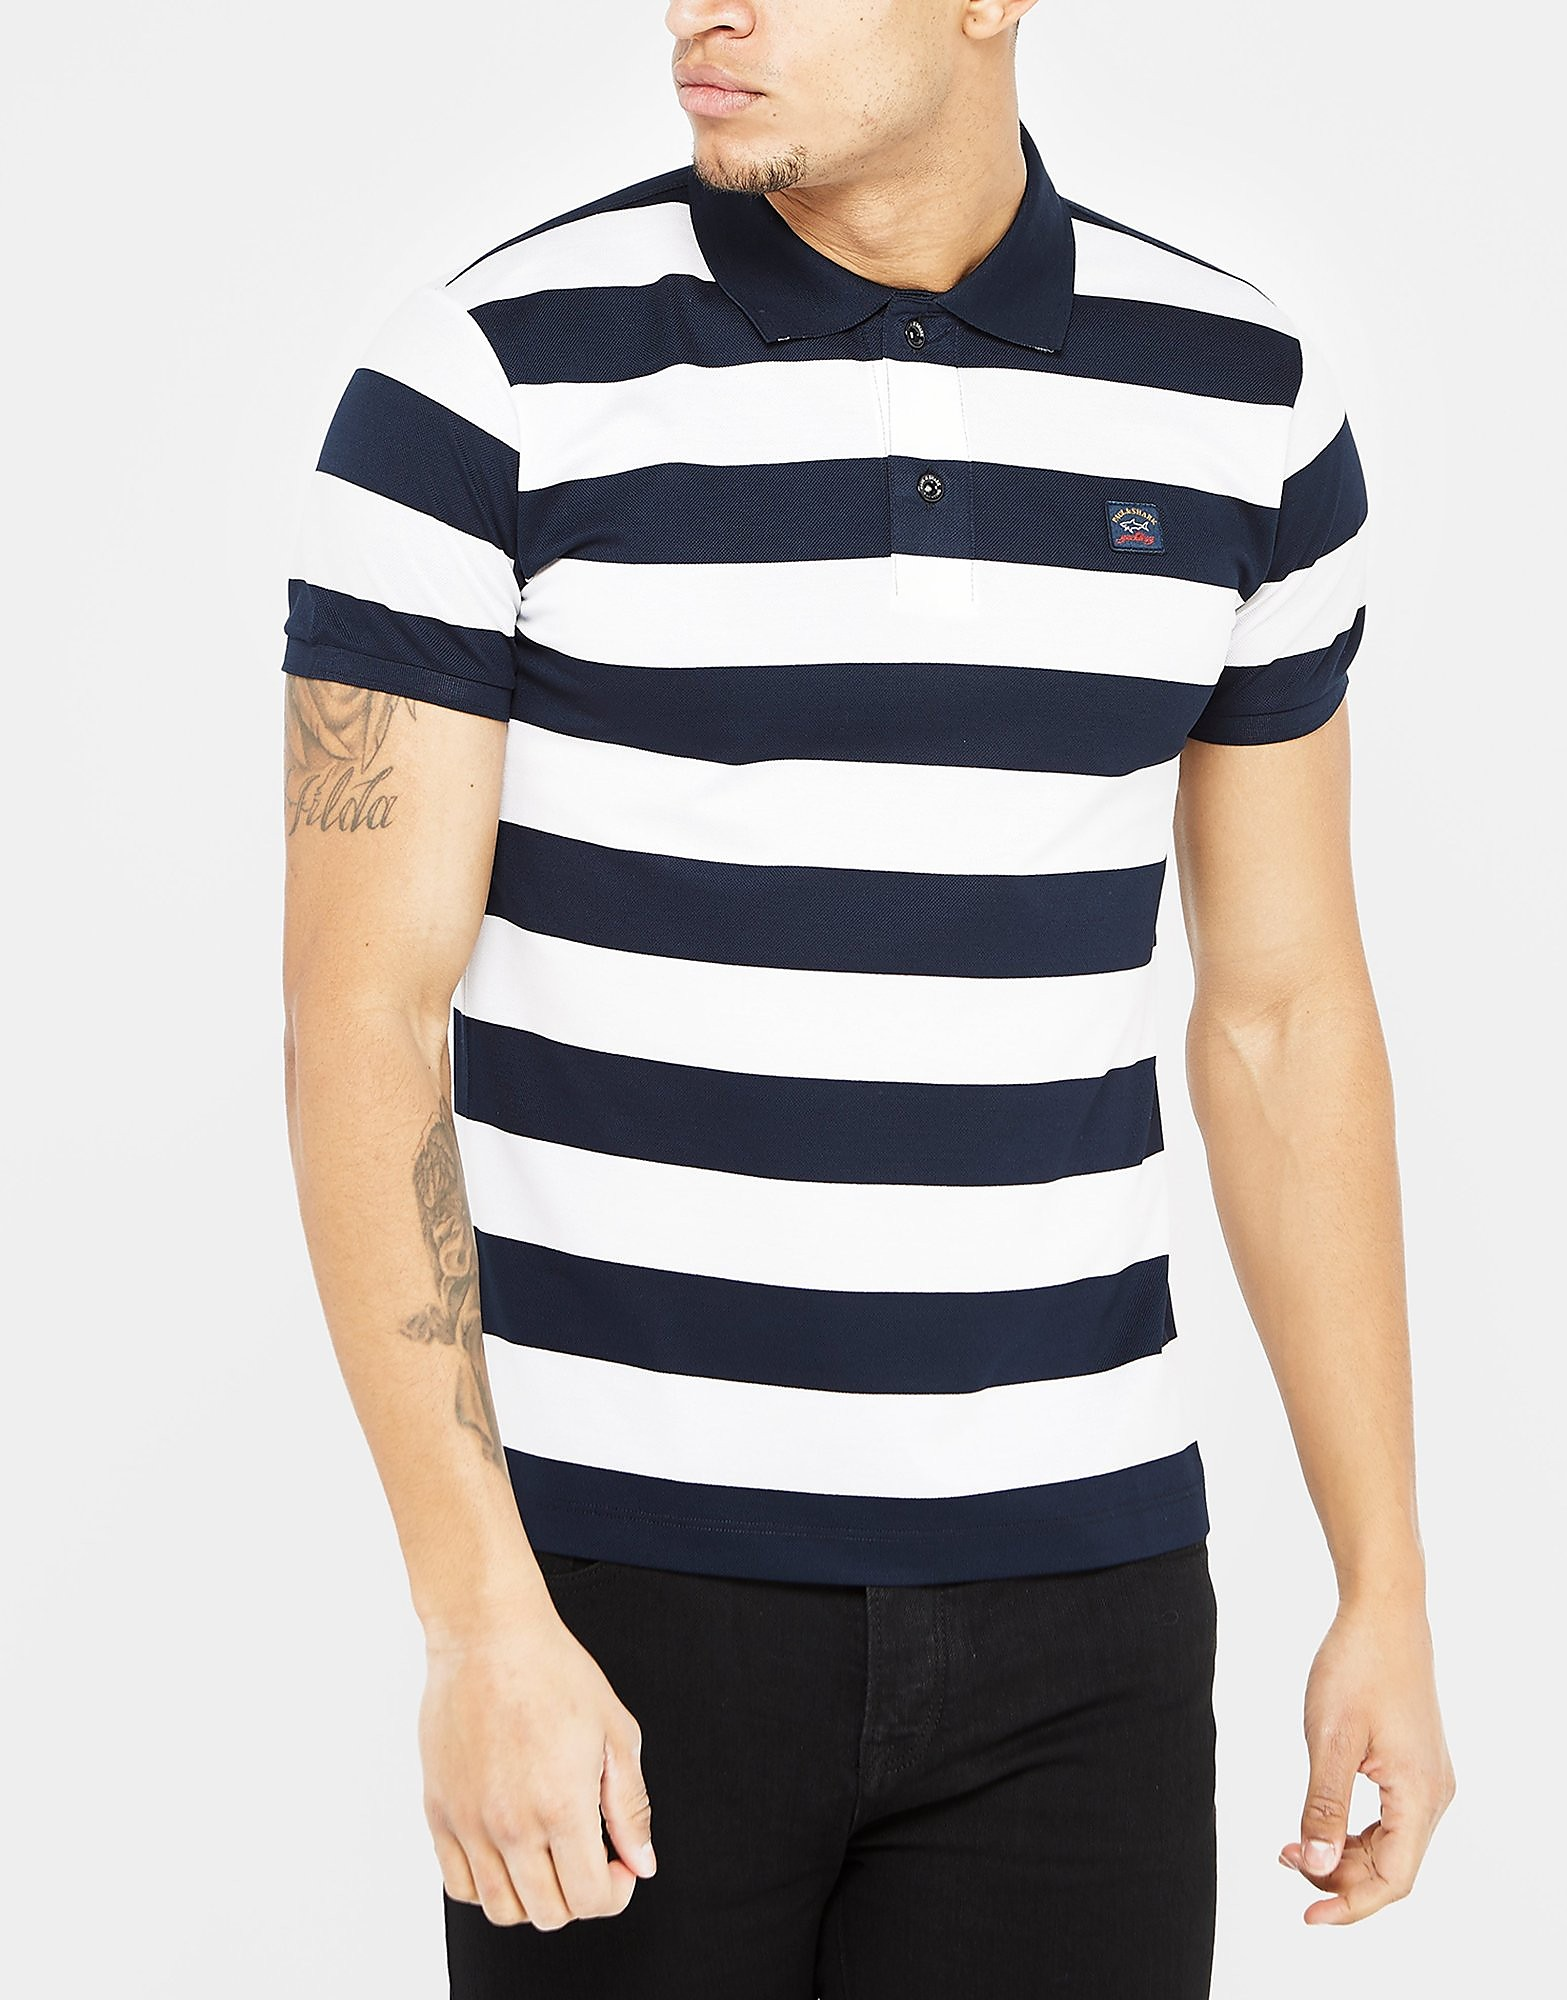 Paul & Shark Black Stripe Short Sleeve Polo Shirt